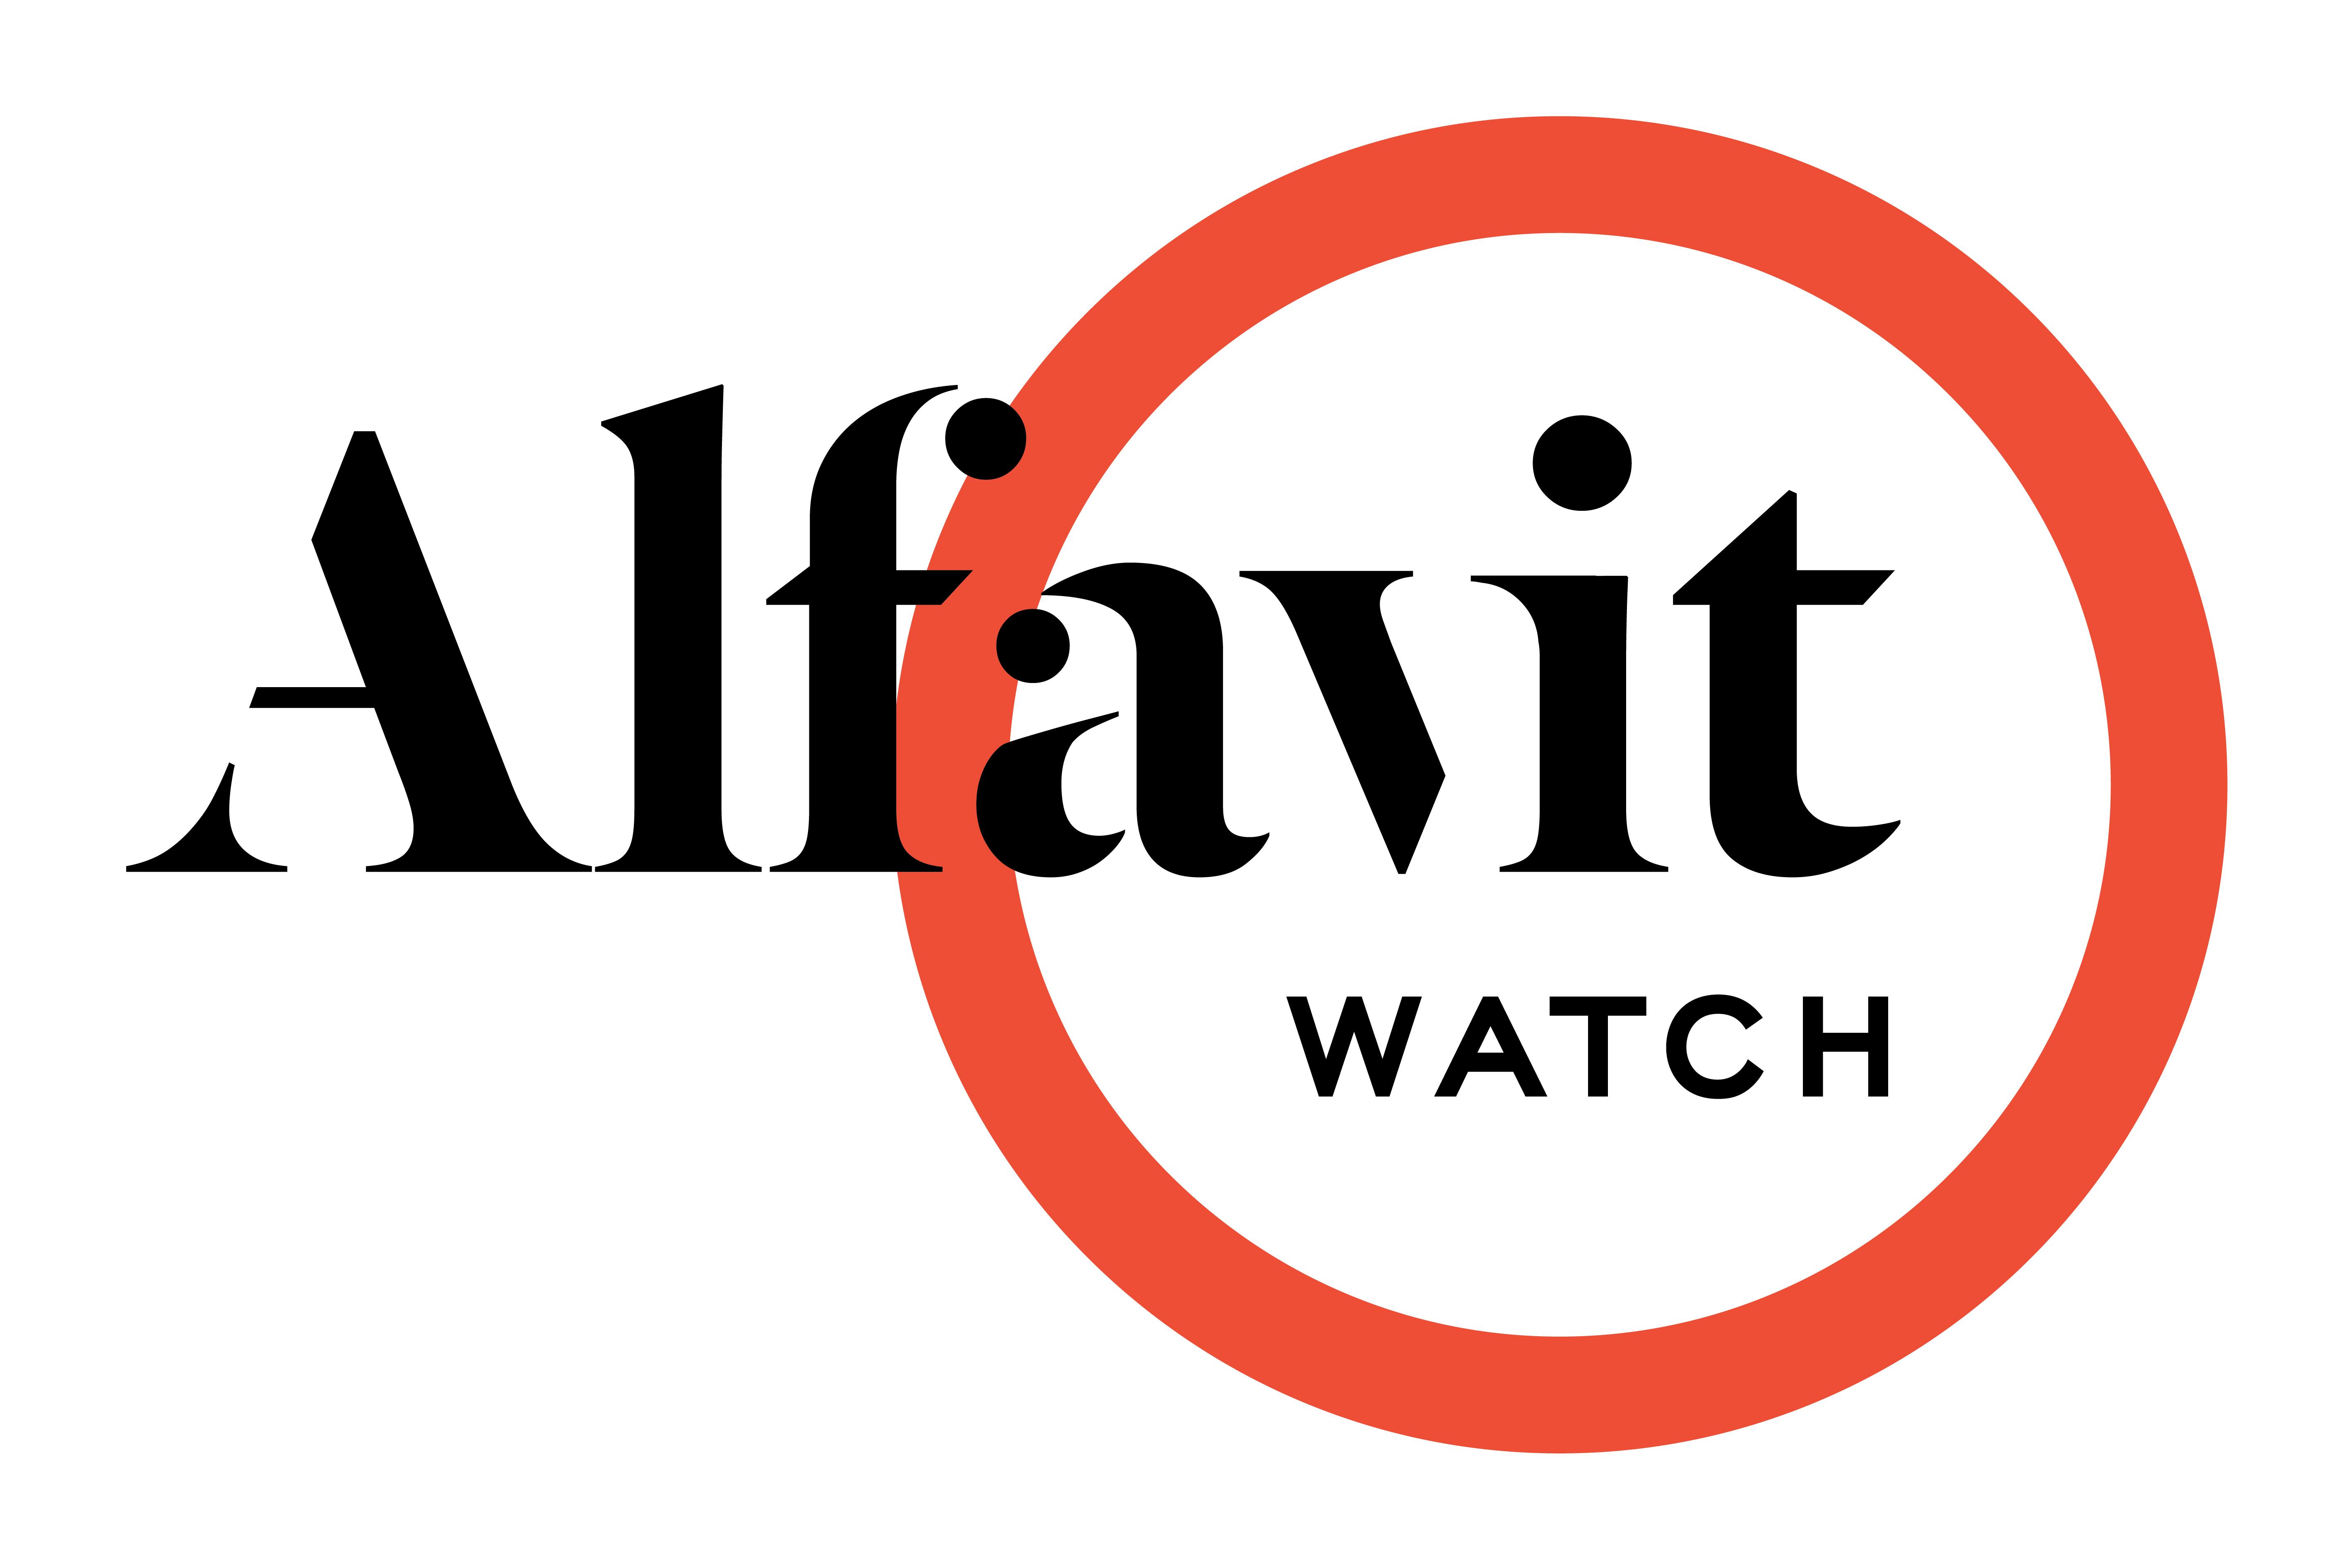 Alfavit watch